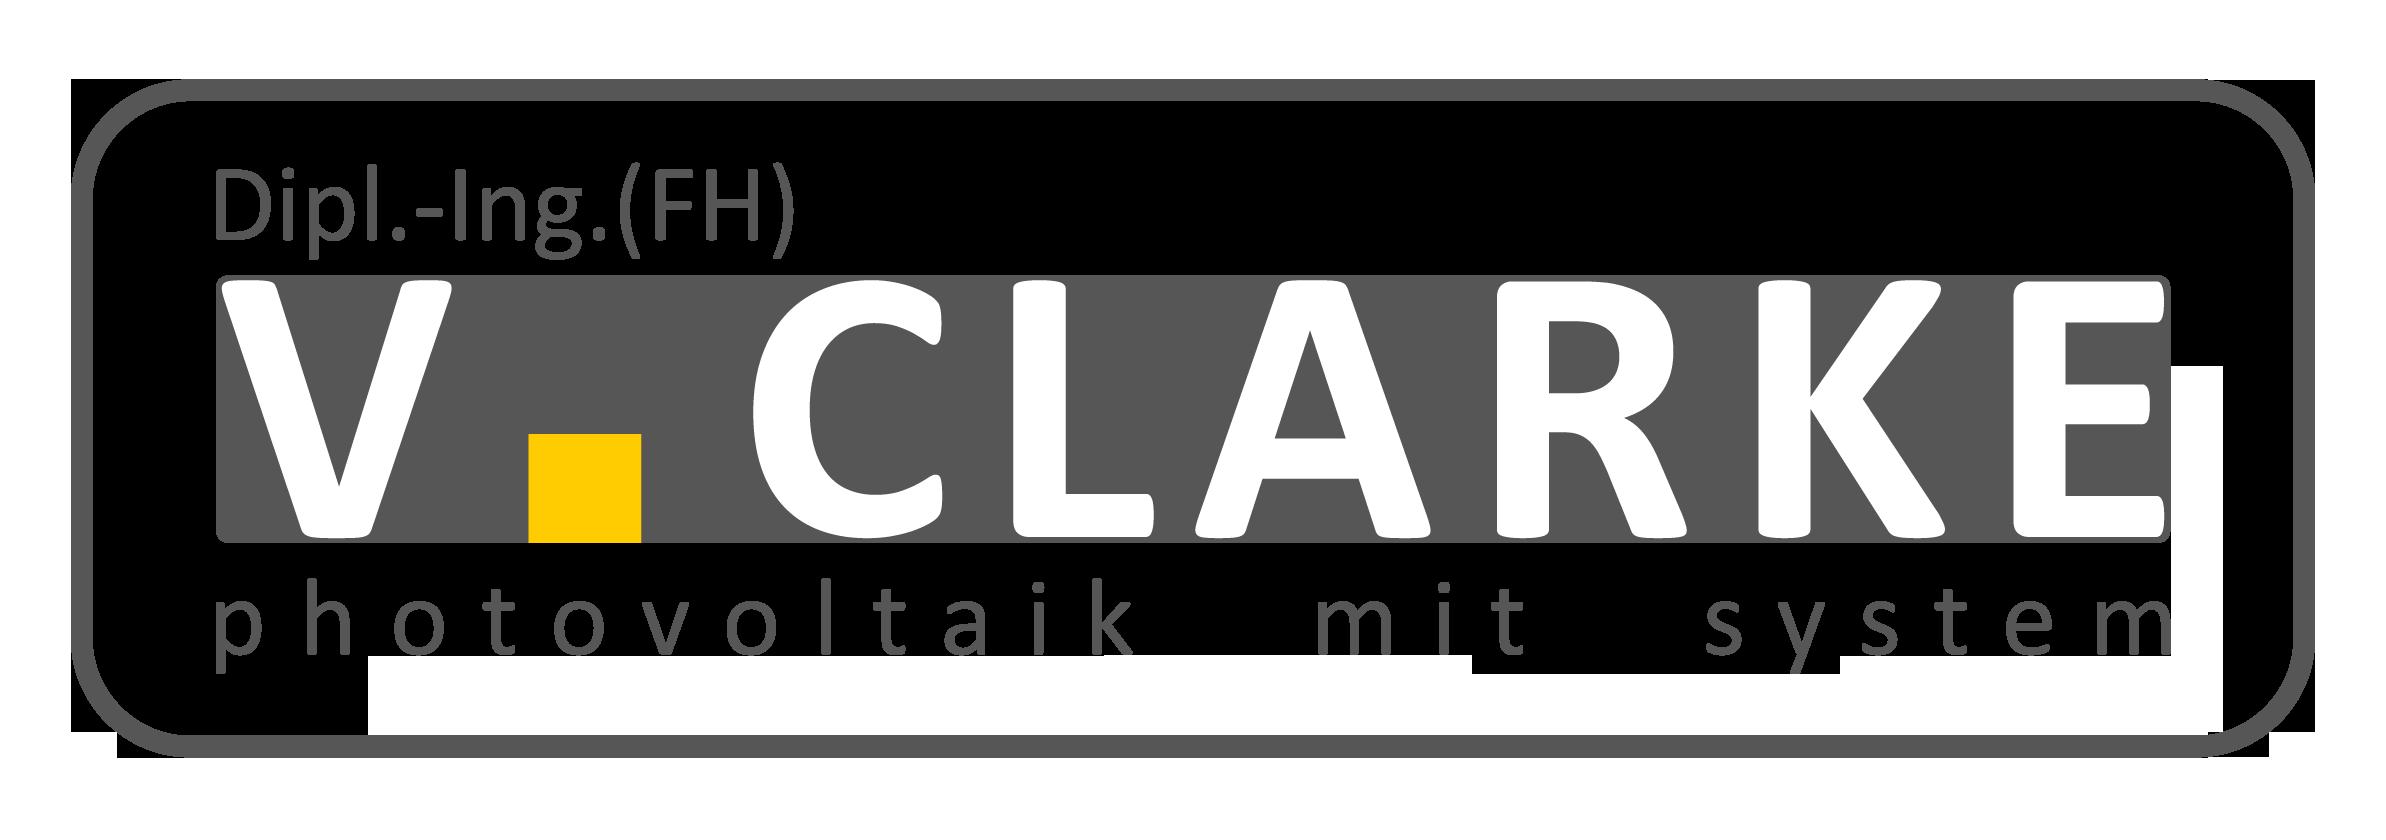 Clarke - Photovoltaik mit System